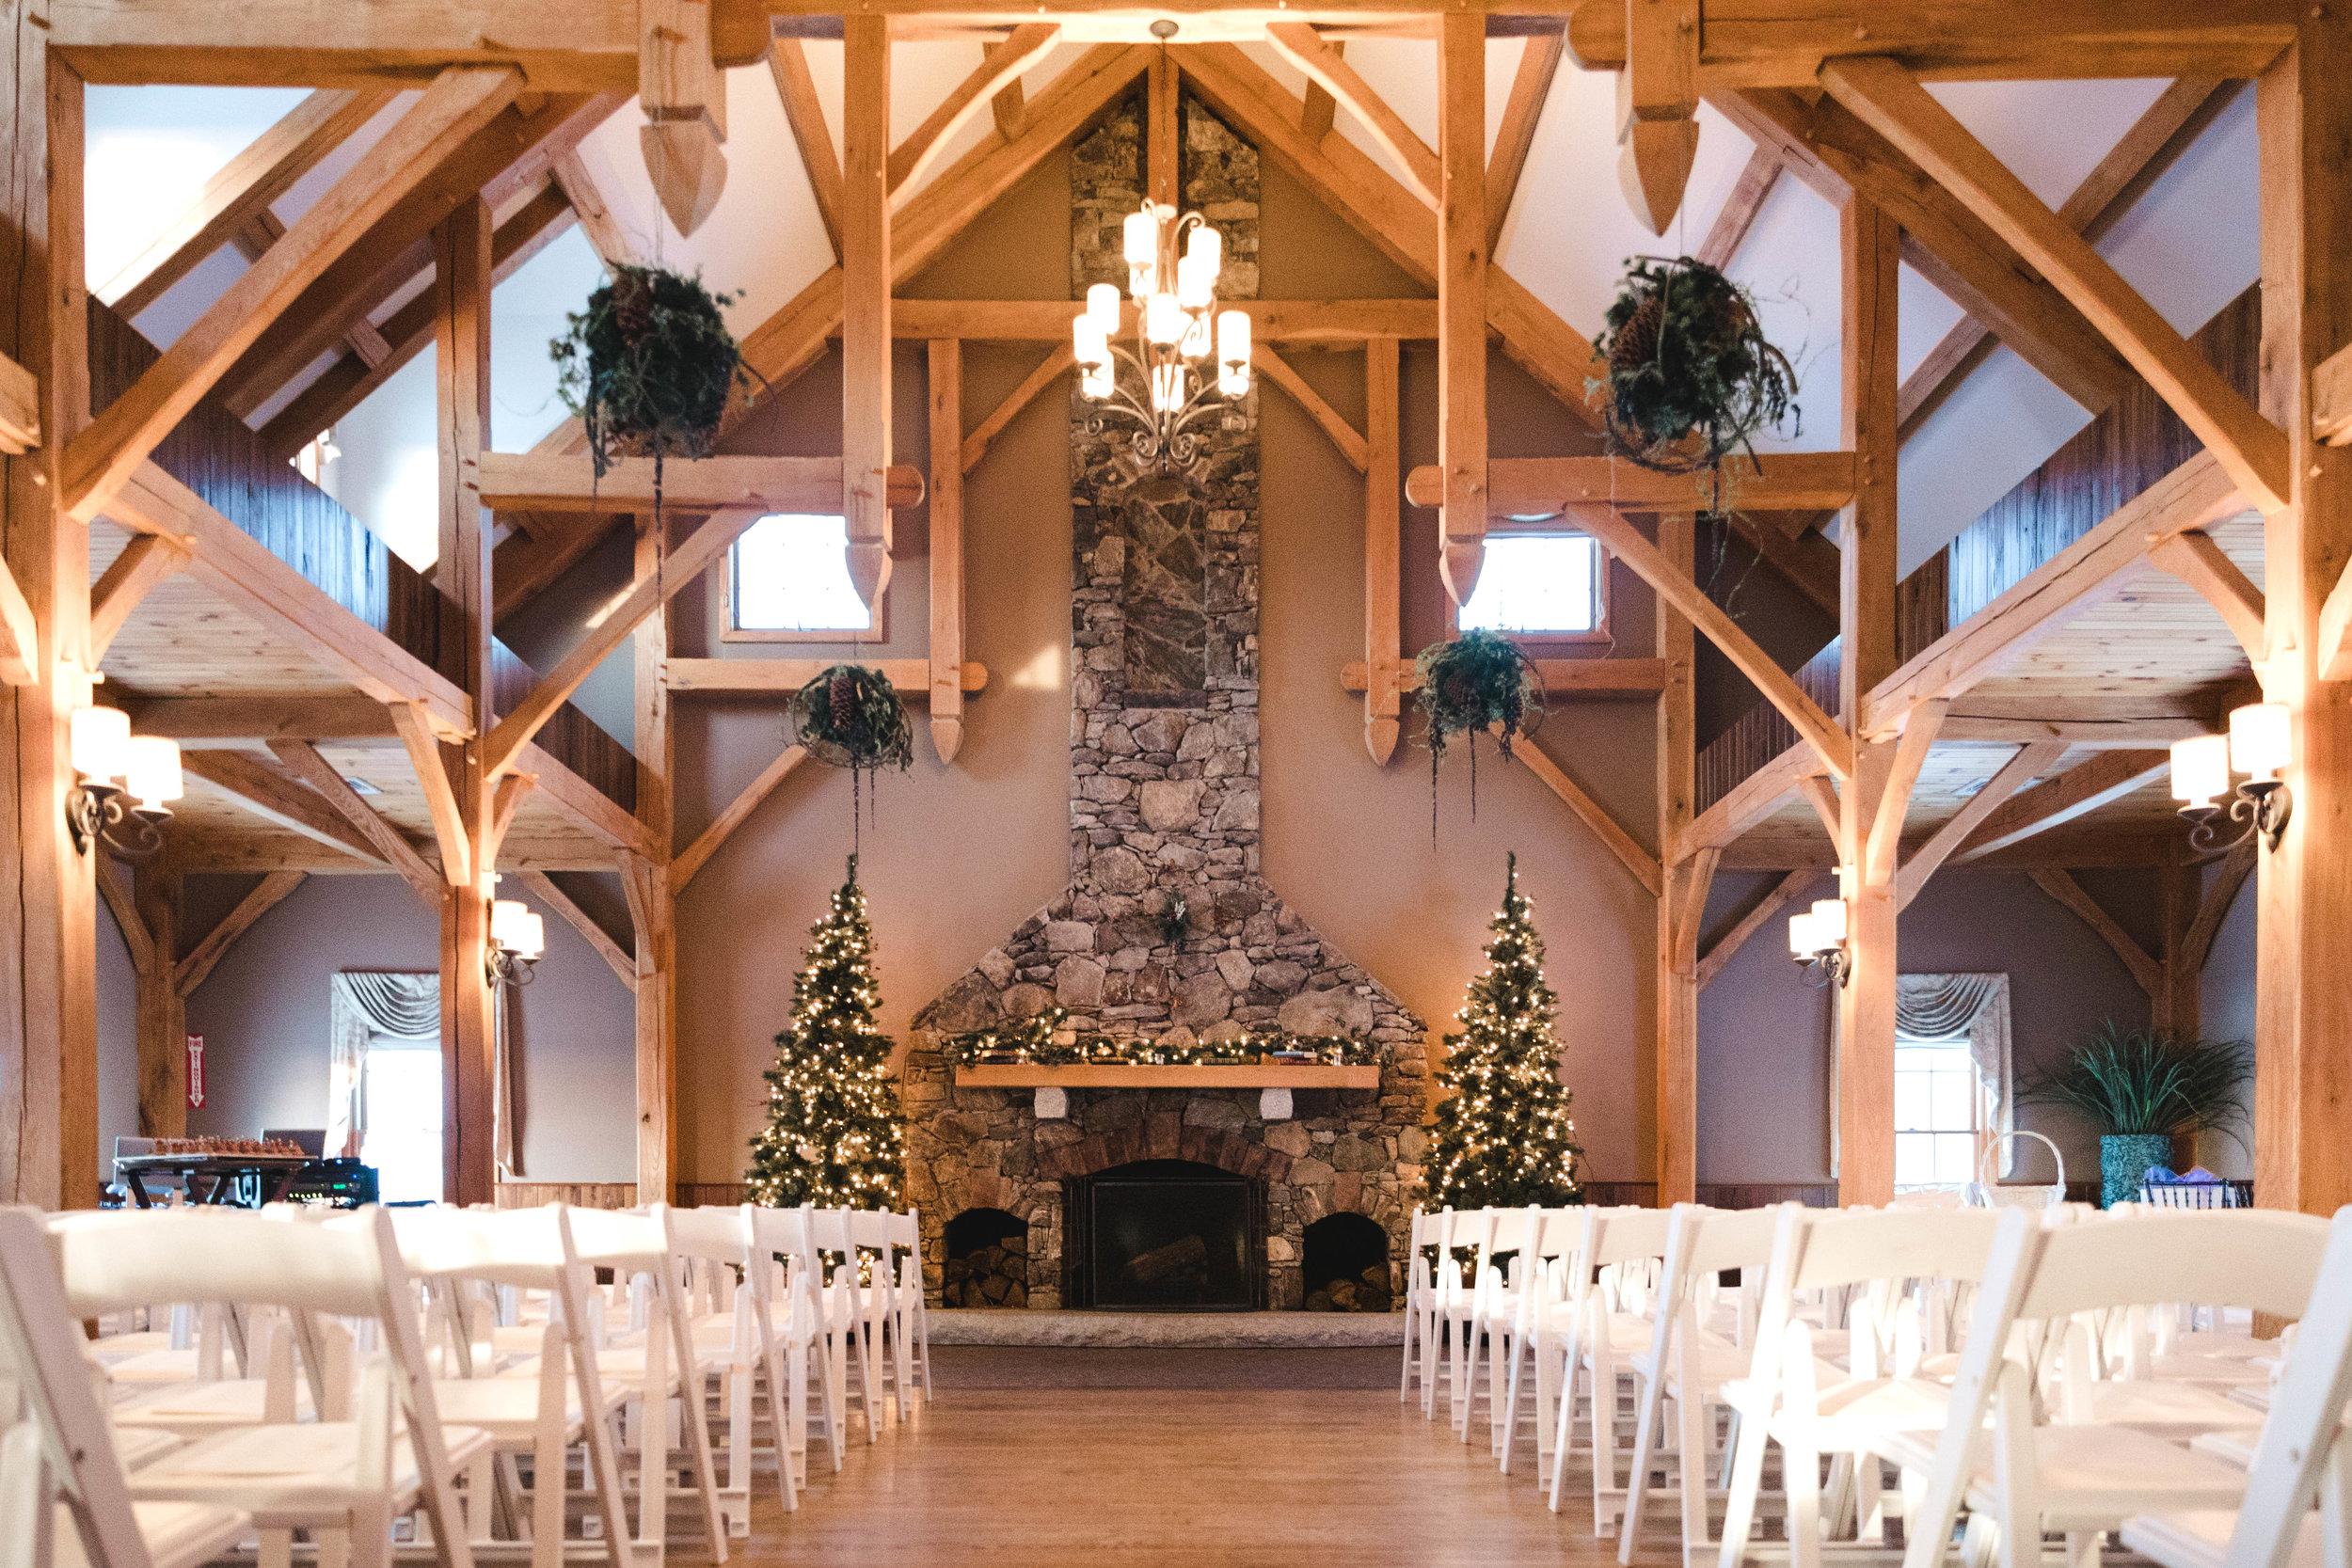 Harrington Farm fireplace set for winter wedding